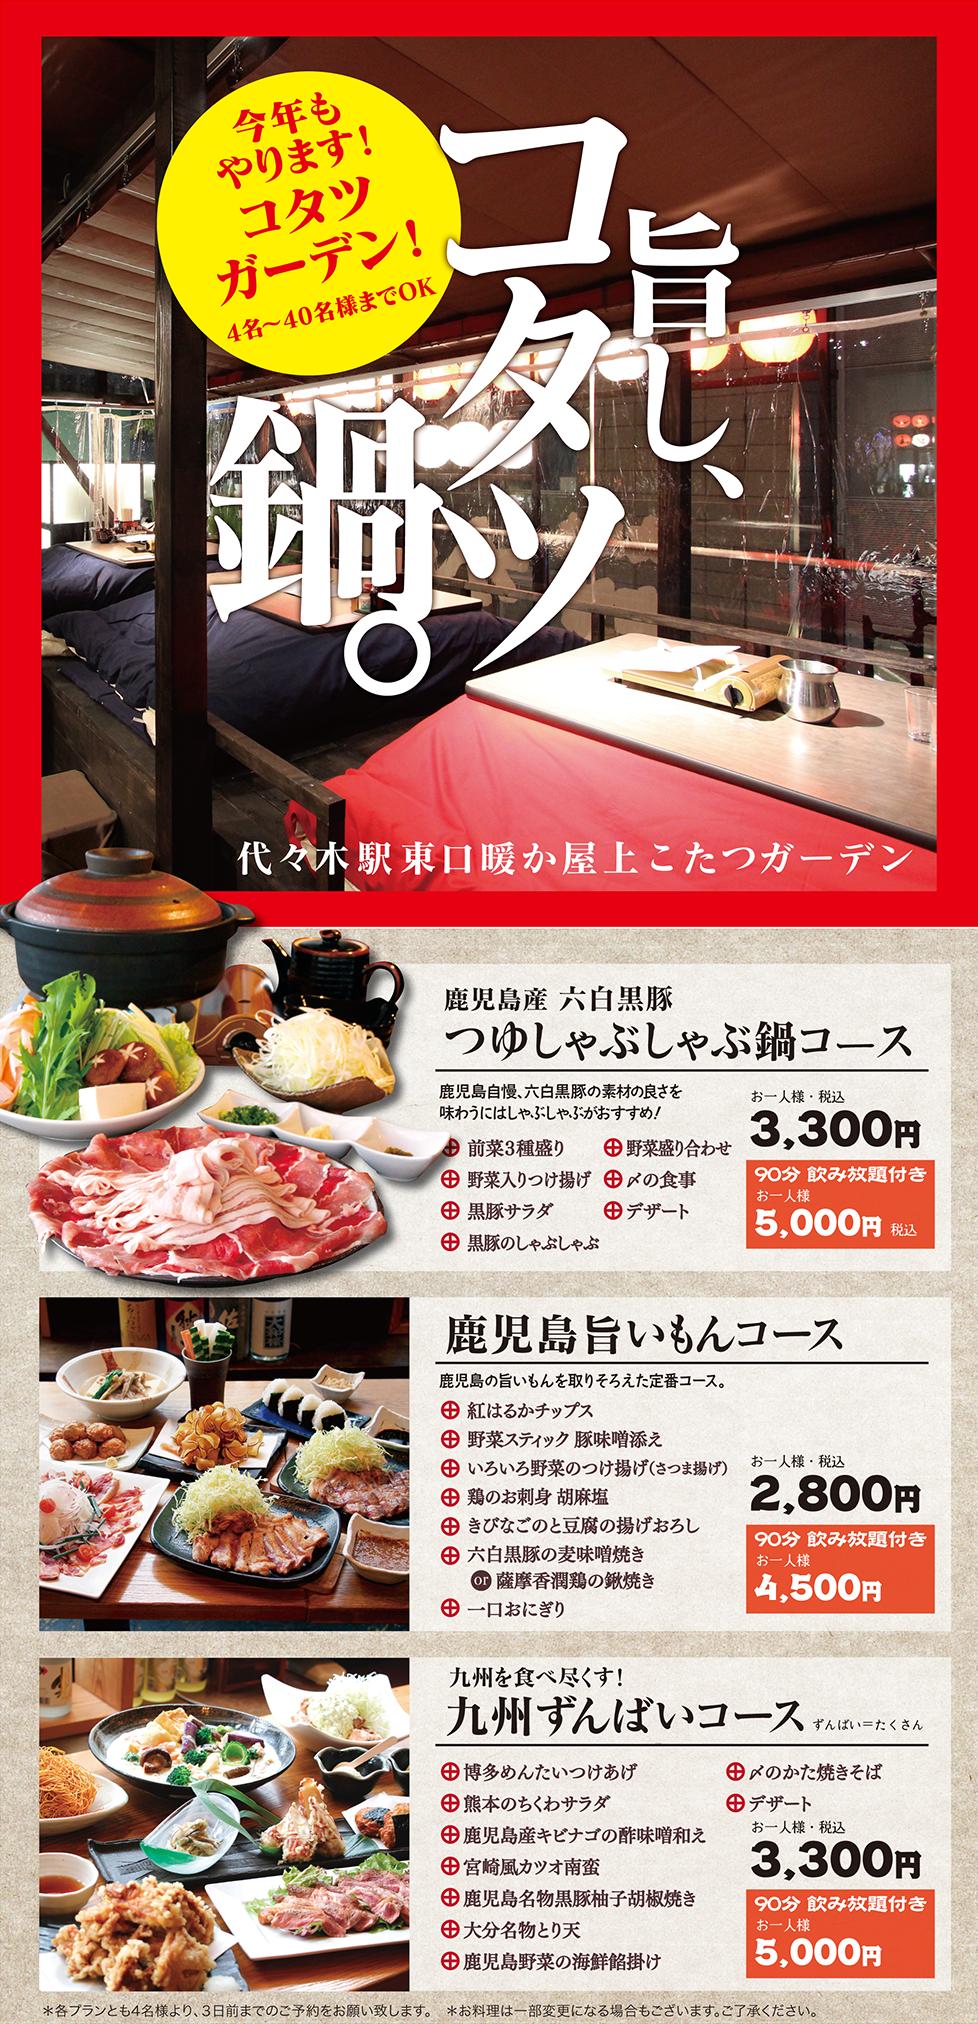 kanoya_1510_kotatsumain-01.png